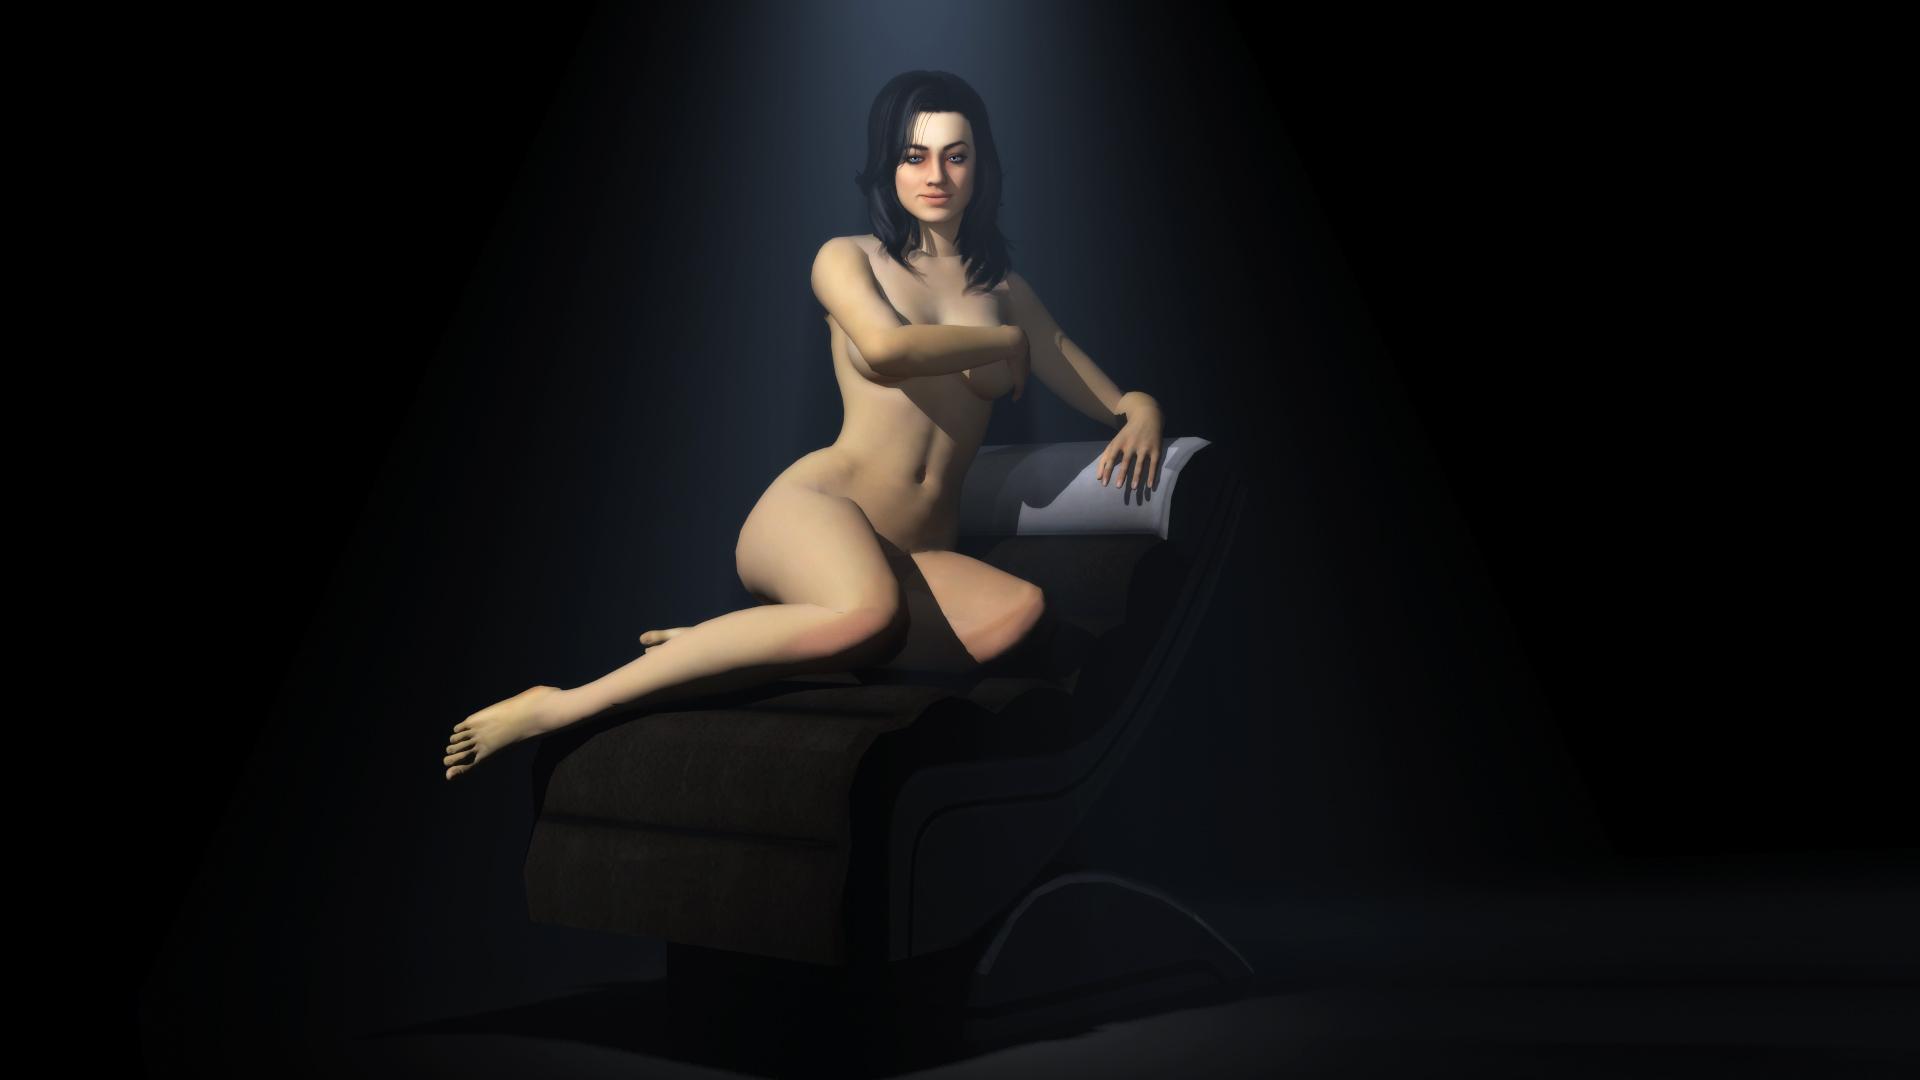 порно фото японская баня